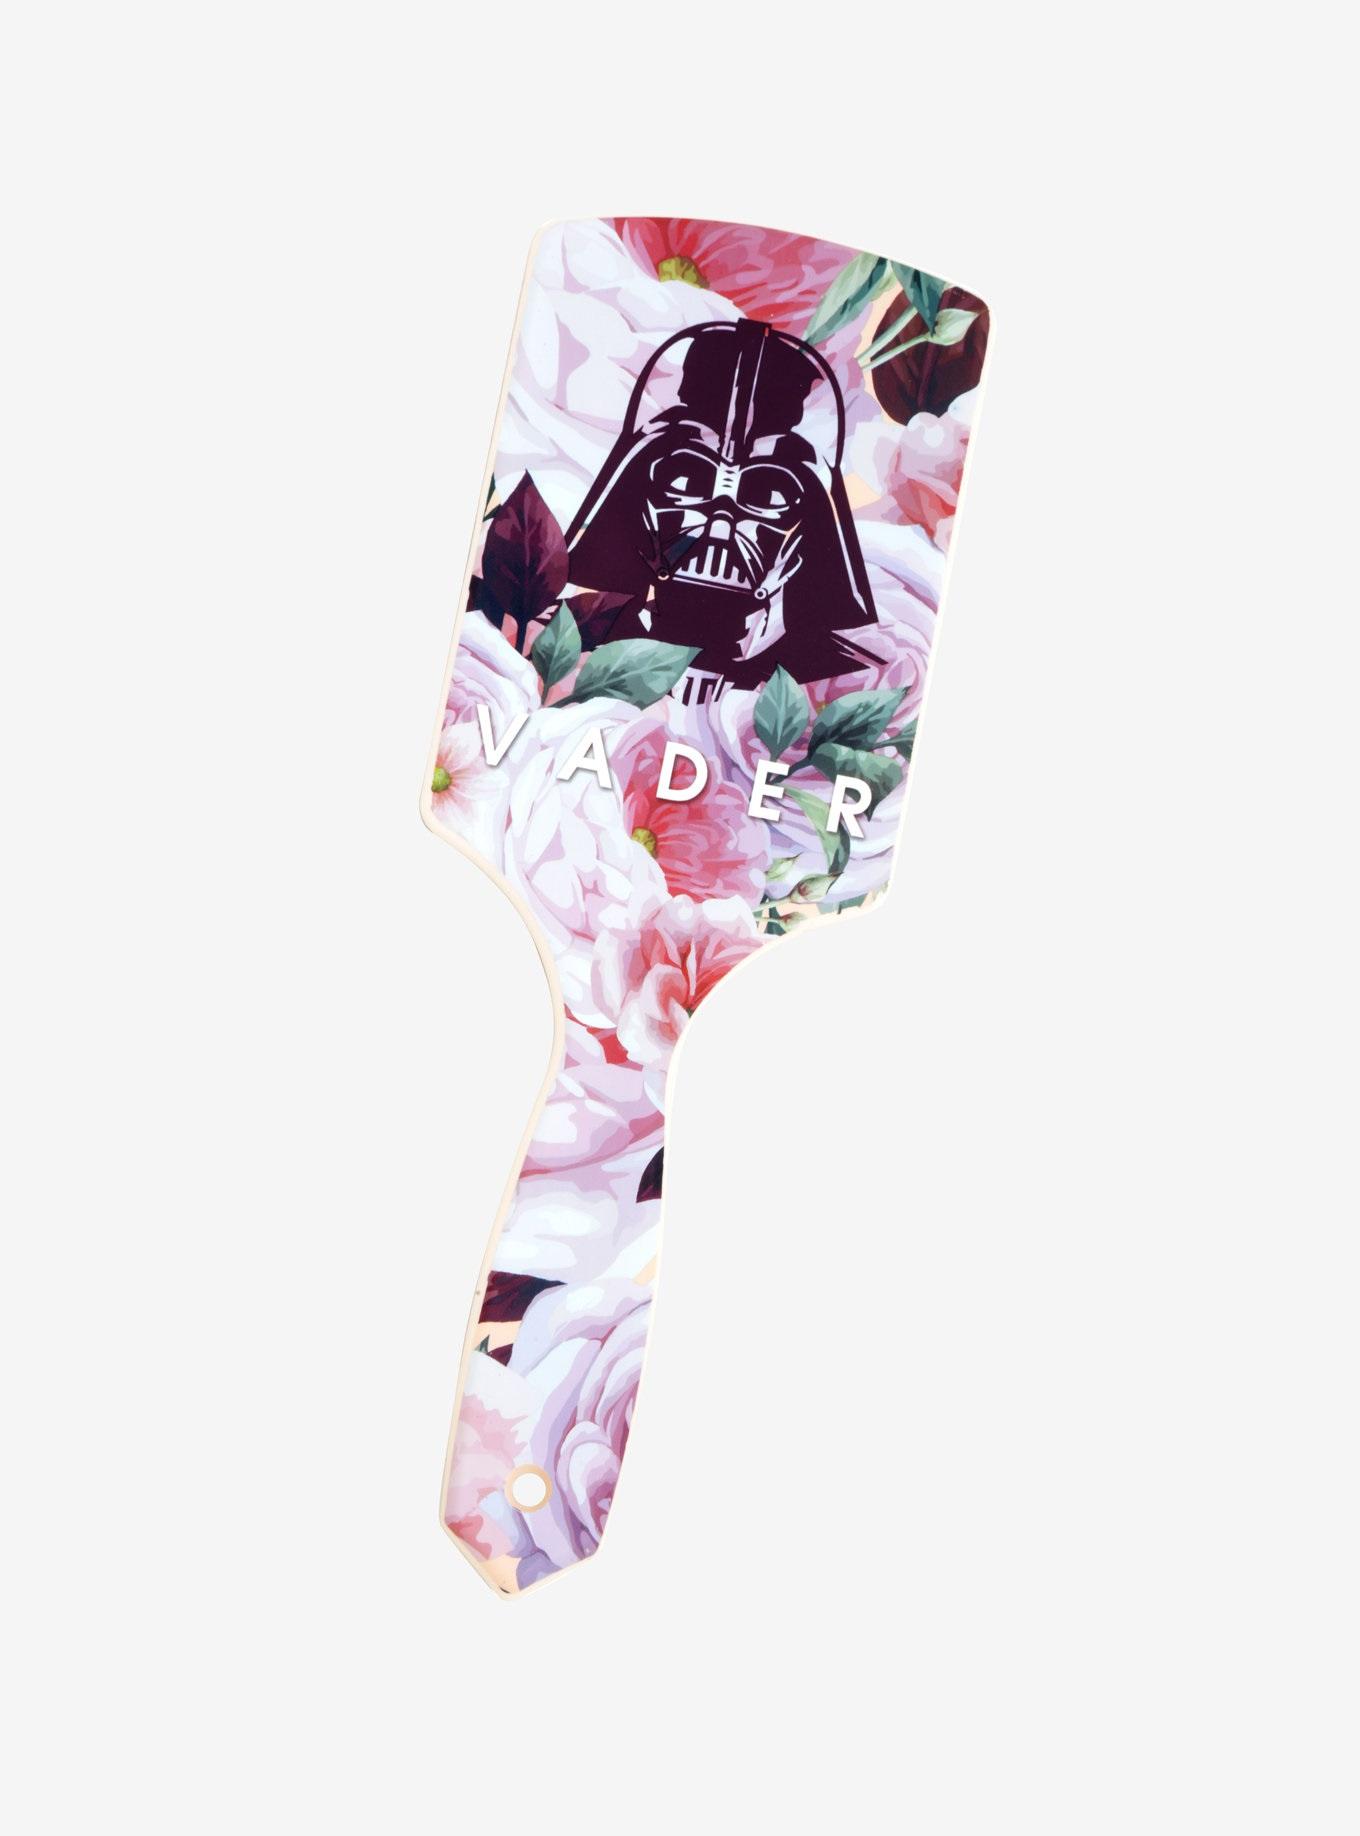 Loungefly x Star Wars Darth Vader Floral Hair Brush at Box Lunch